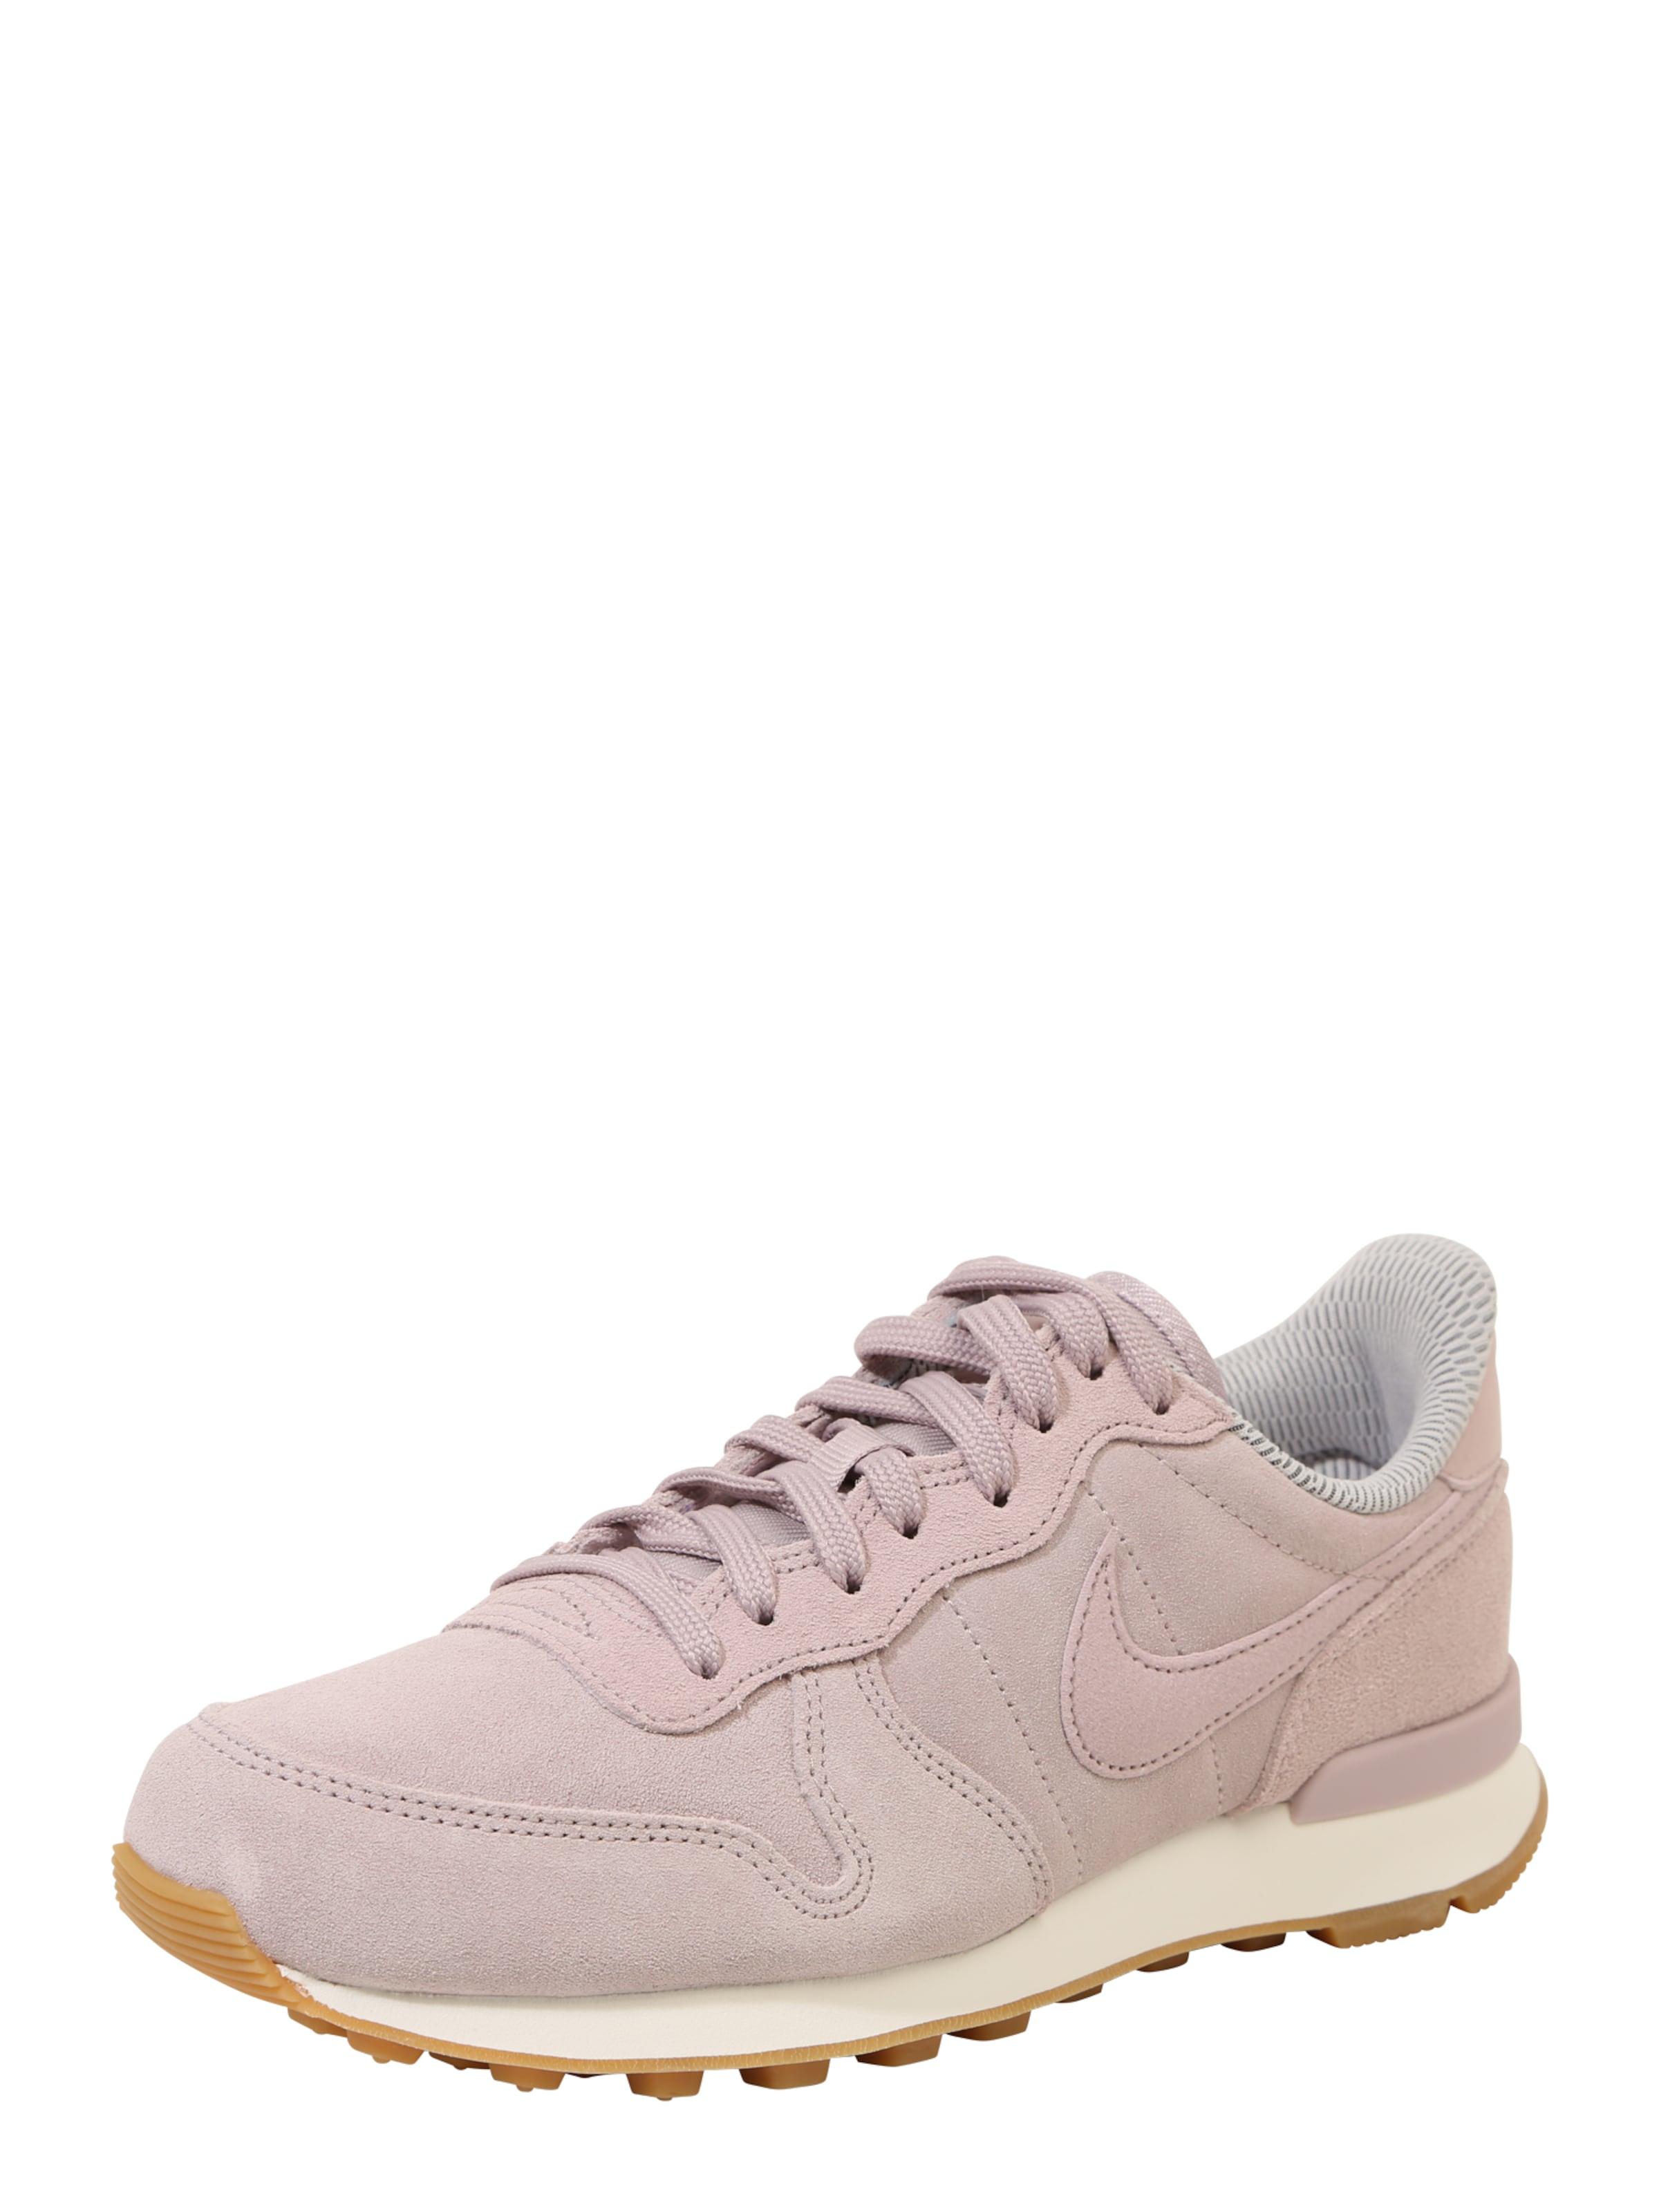 Nike Sportswear | Turnschuhe Internationalist